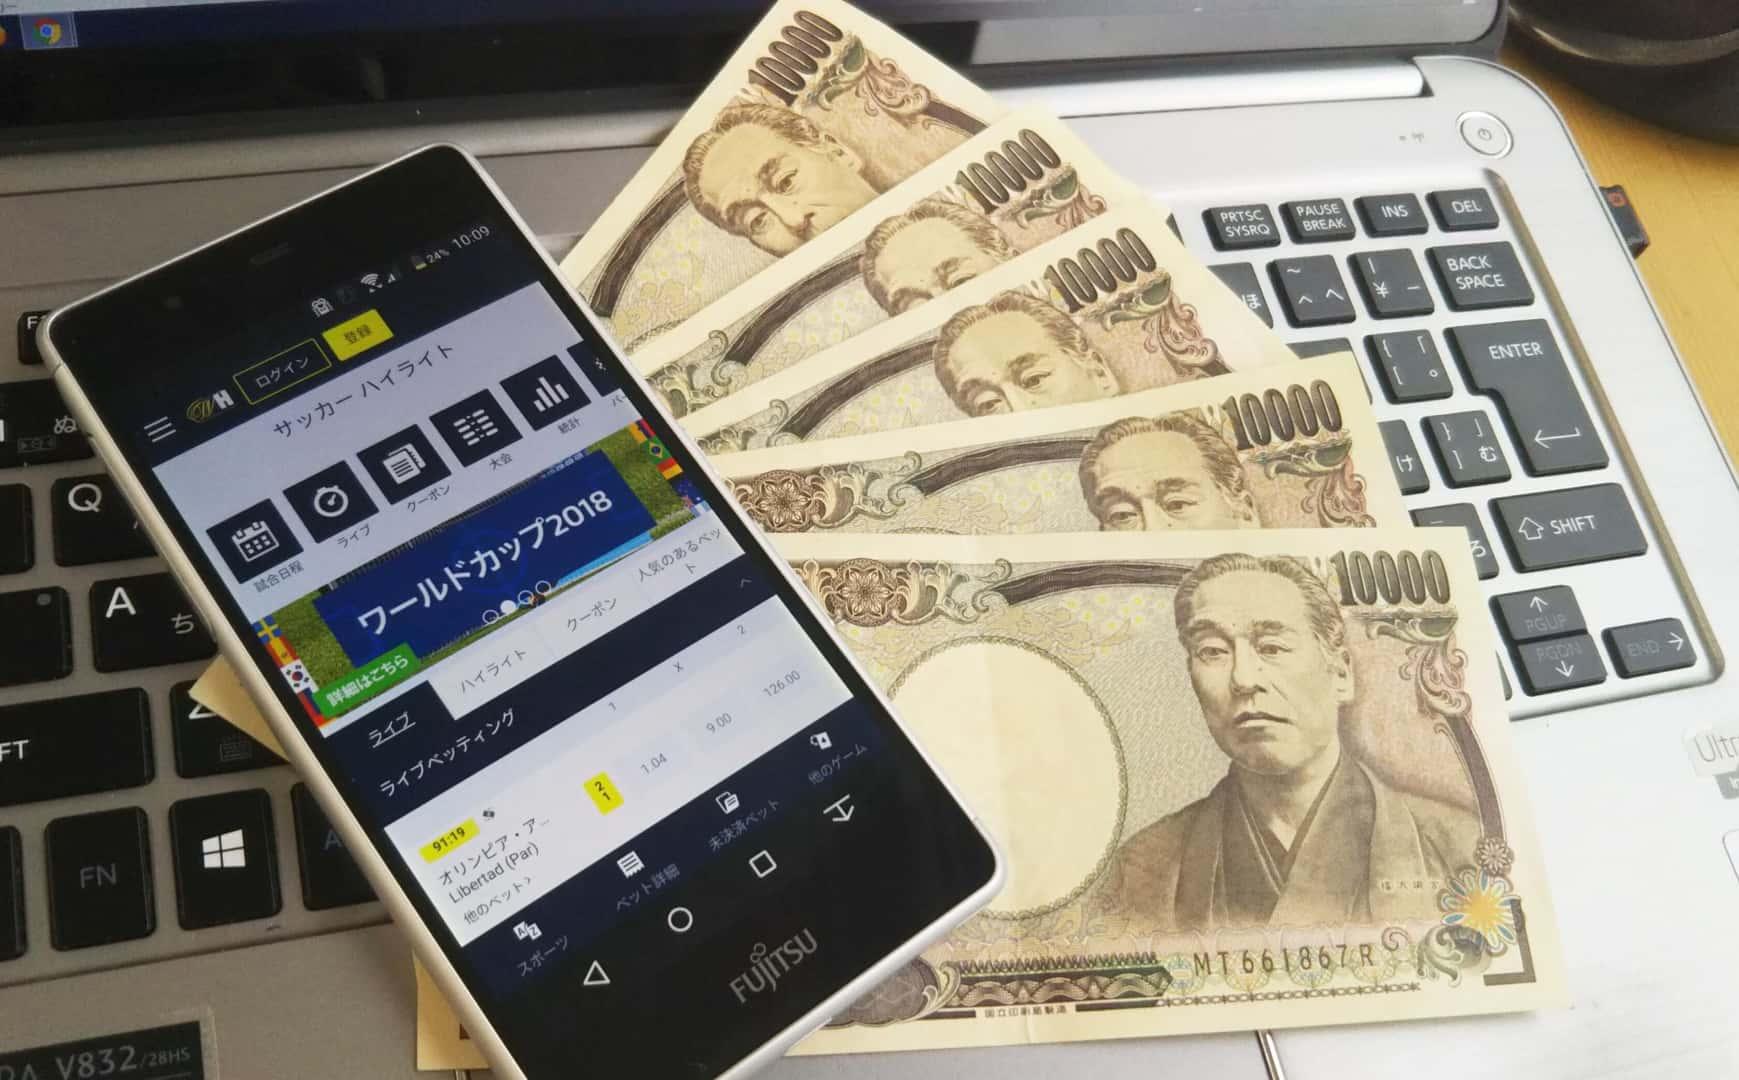 PCの上に置かれたウィリアムヒルが表示されたスマホと1万円札5枚